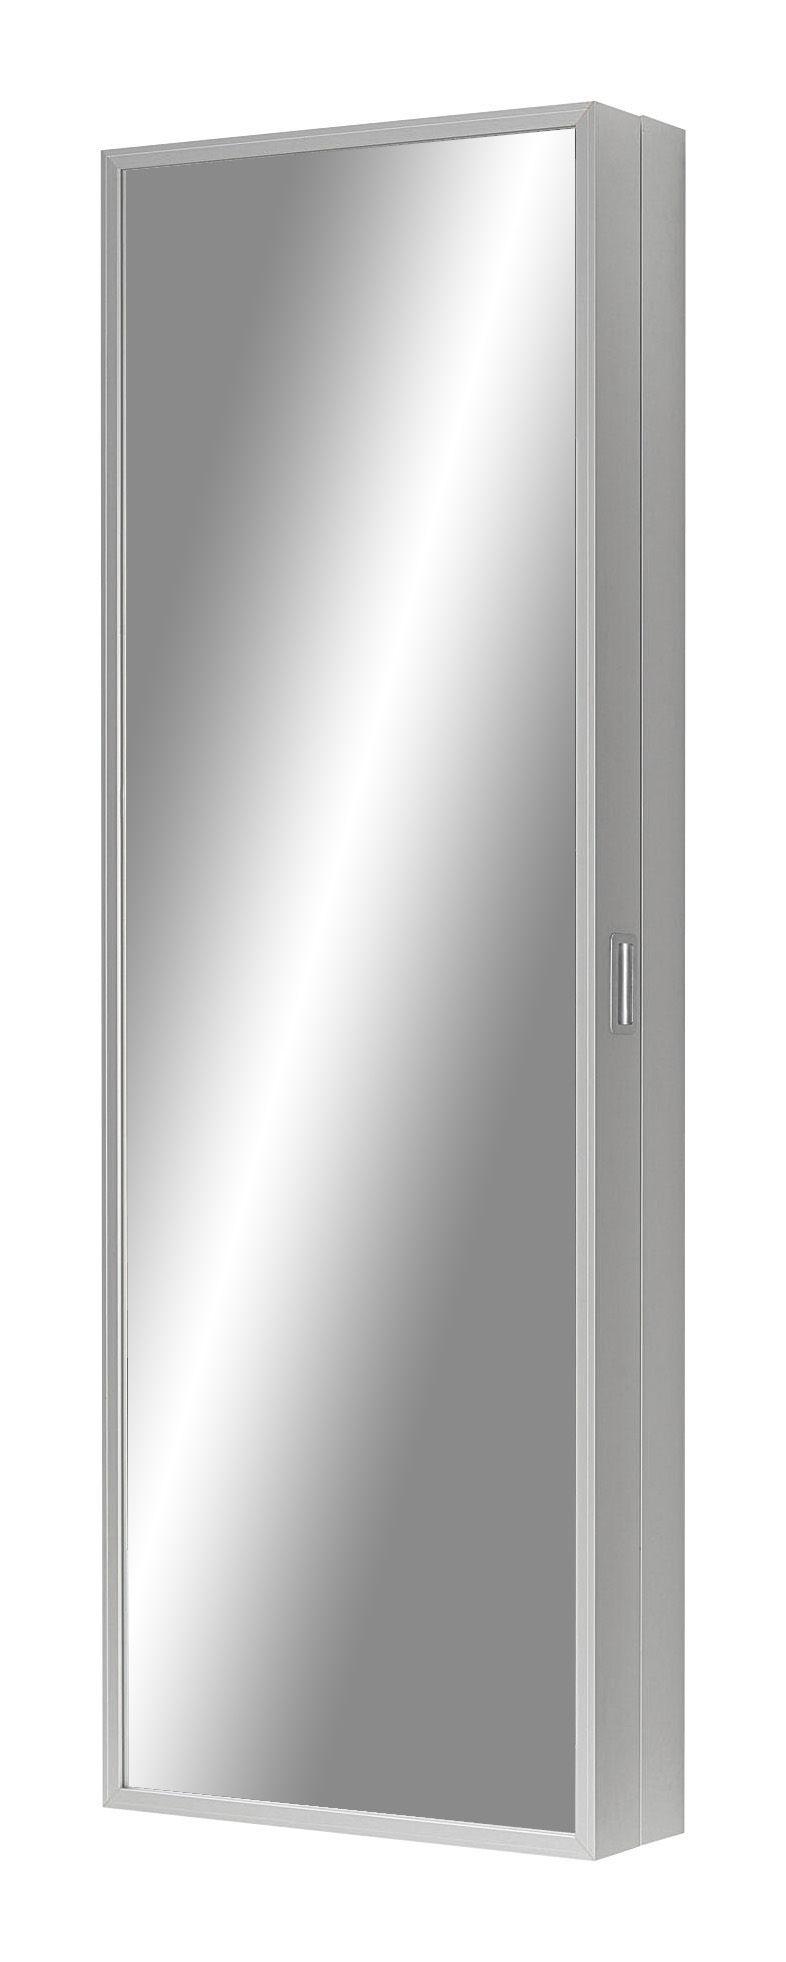 Mobilier - Meubles de rangement - Armoire Duty Box - Kristalia - Aluminium - Miroir - Aluminium anodisé, Miroir